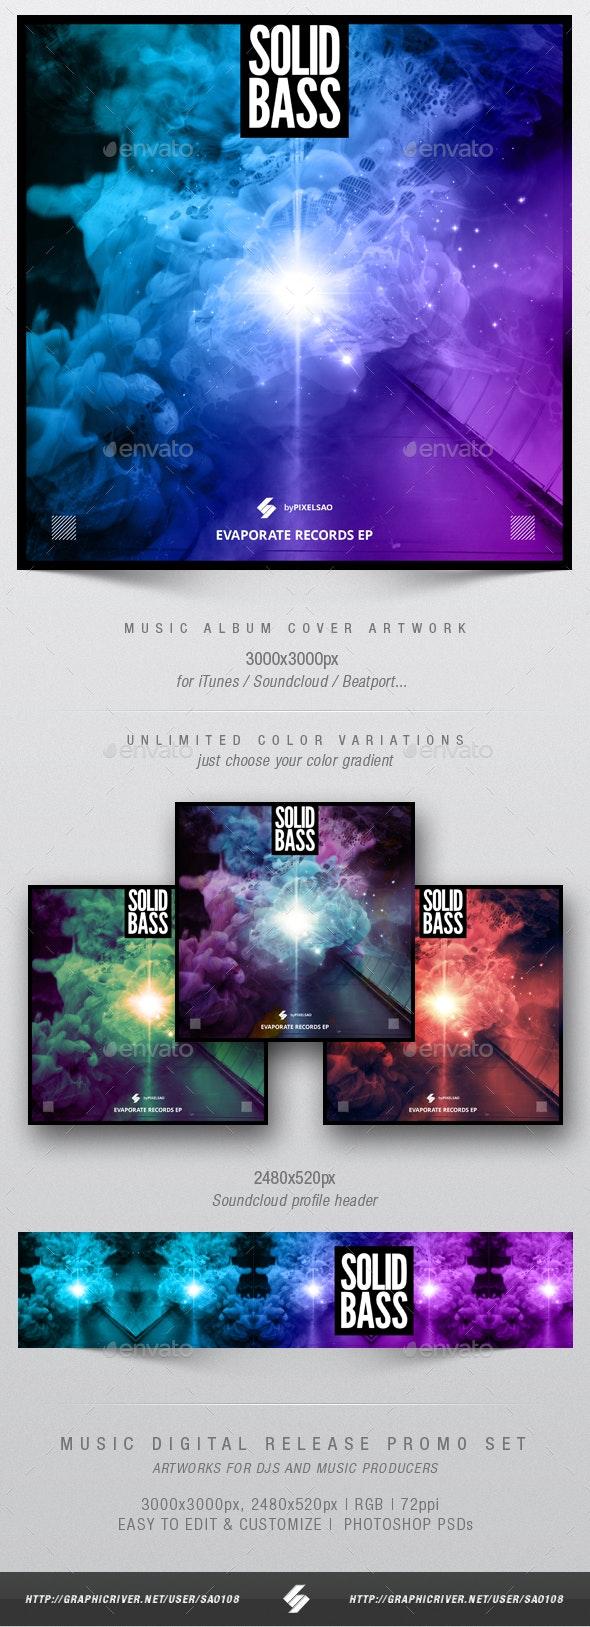 Solid Bass - Music Album Cover Artwork Template - Miscellaneous Social Media